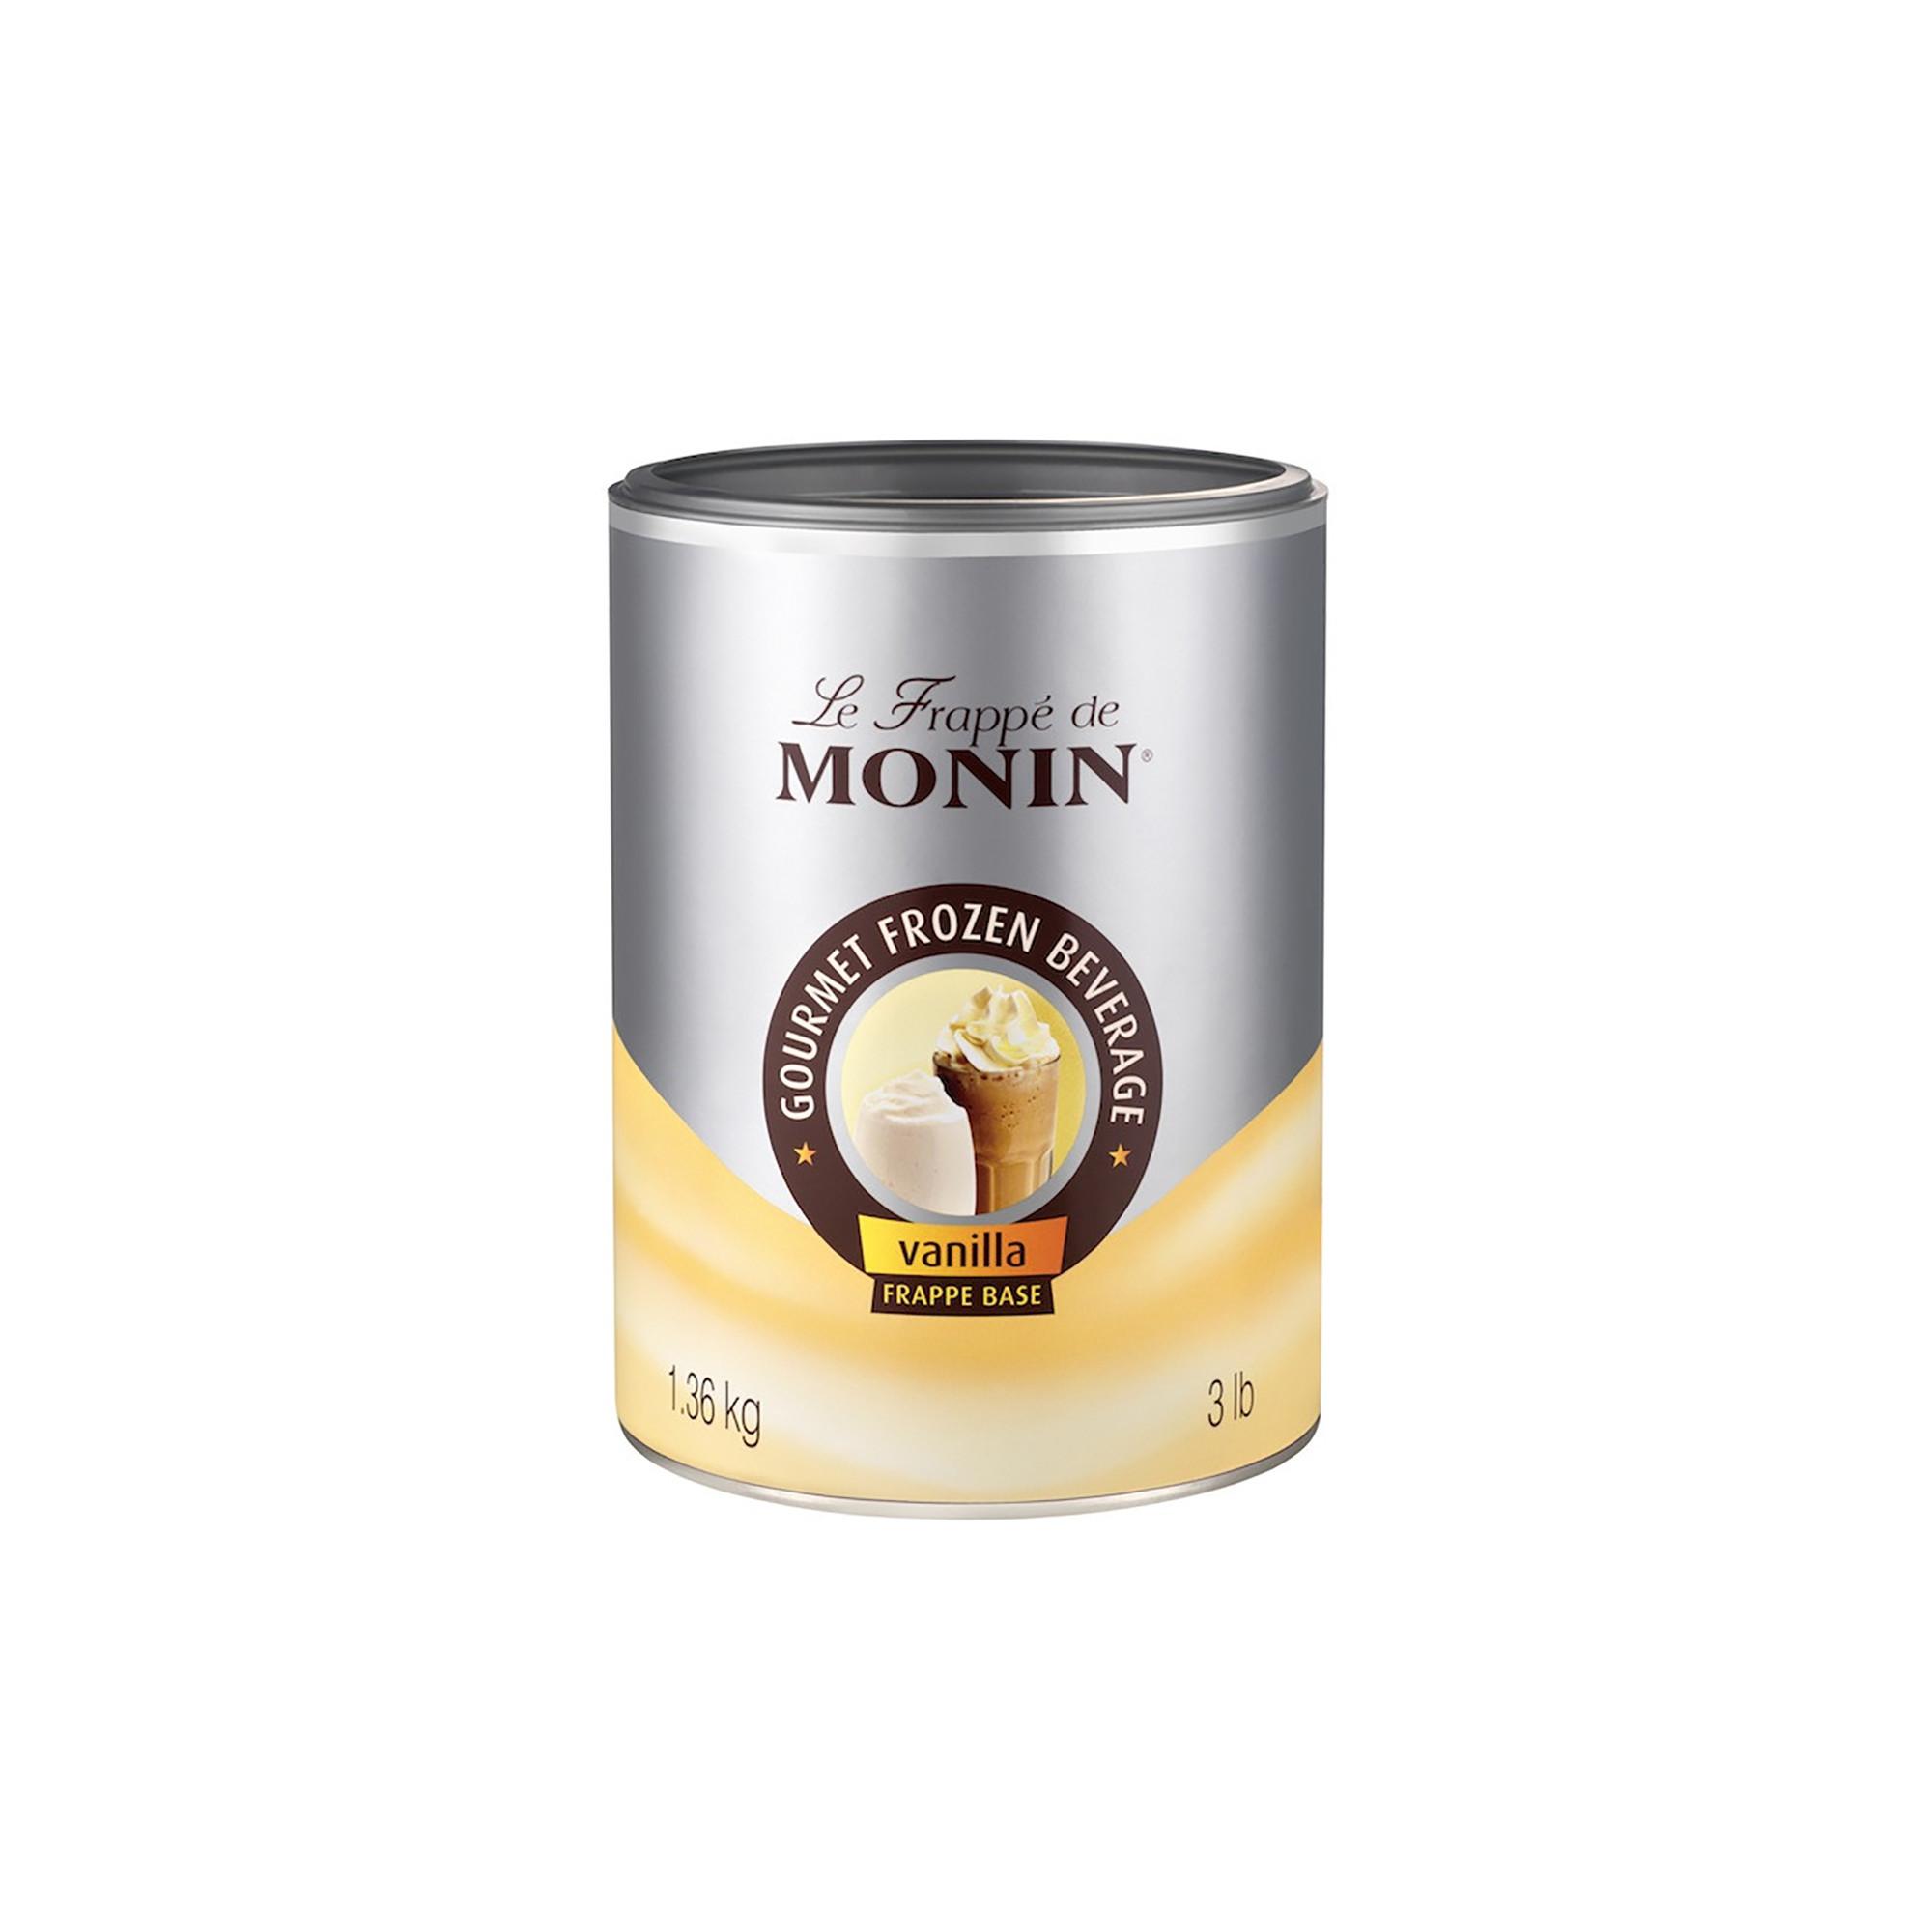 Monin Frappé Base, Vanilla - 1,36 kg